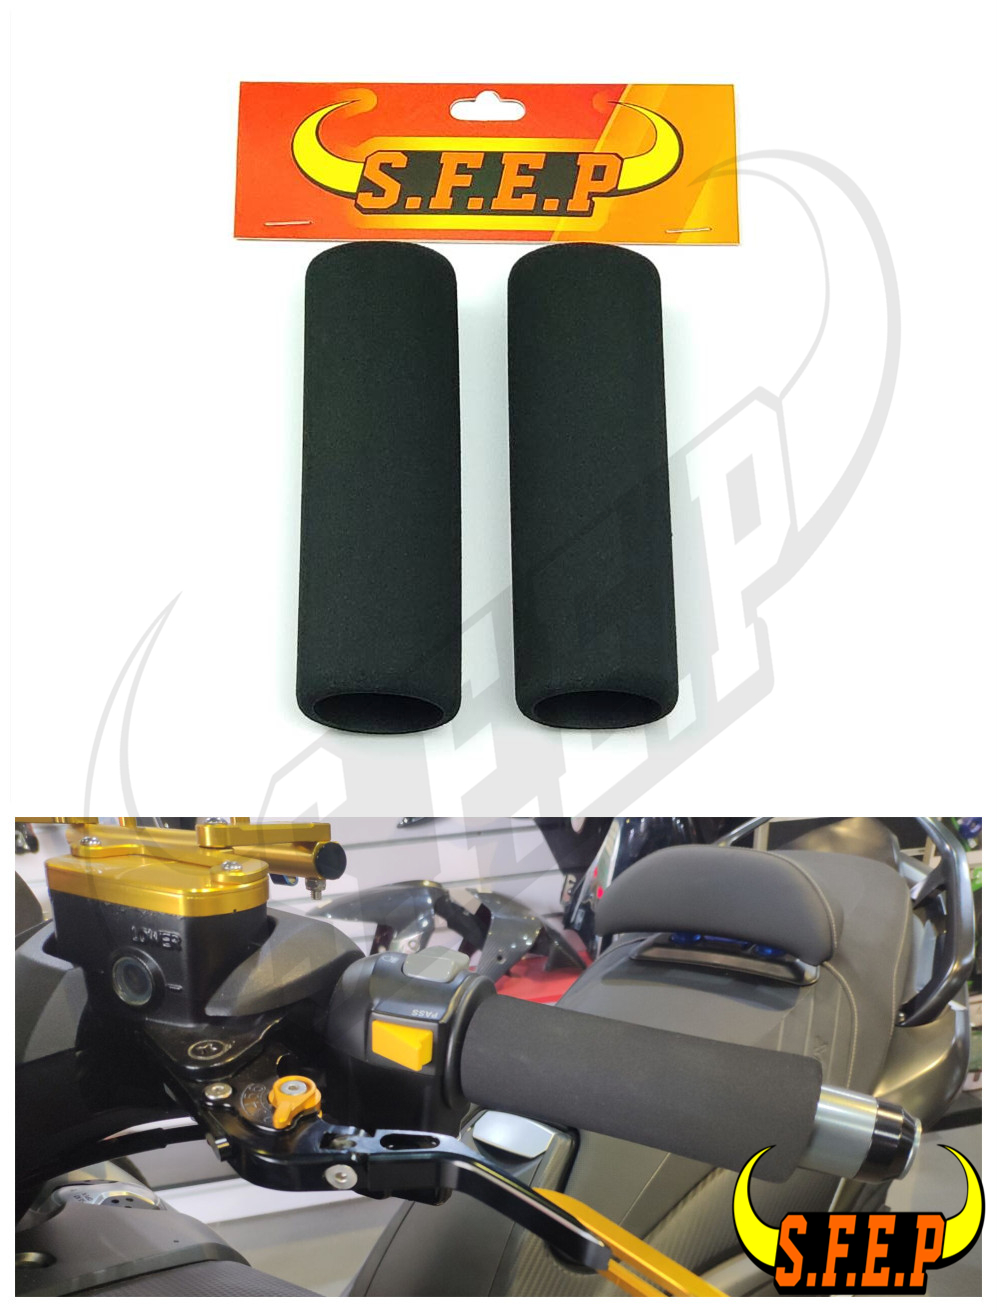 Universal Foam Anit-Vibration Motorcycle Comfort Grip Covers For BMW Kawasaki Honda KTM Yamaha Suzuki Harley Ducati Aprilia